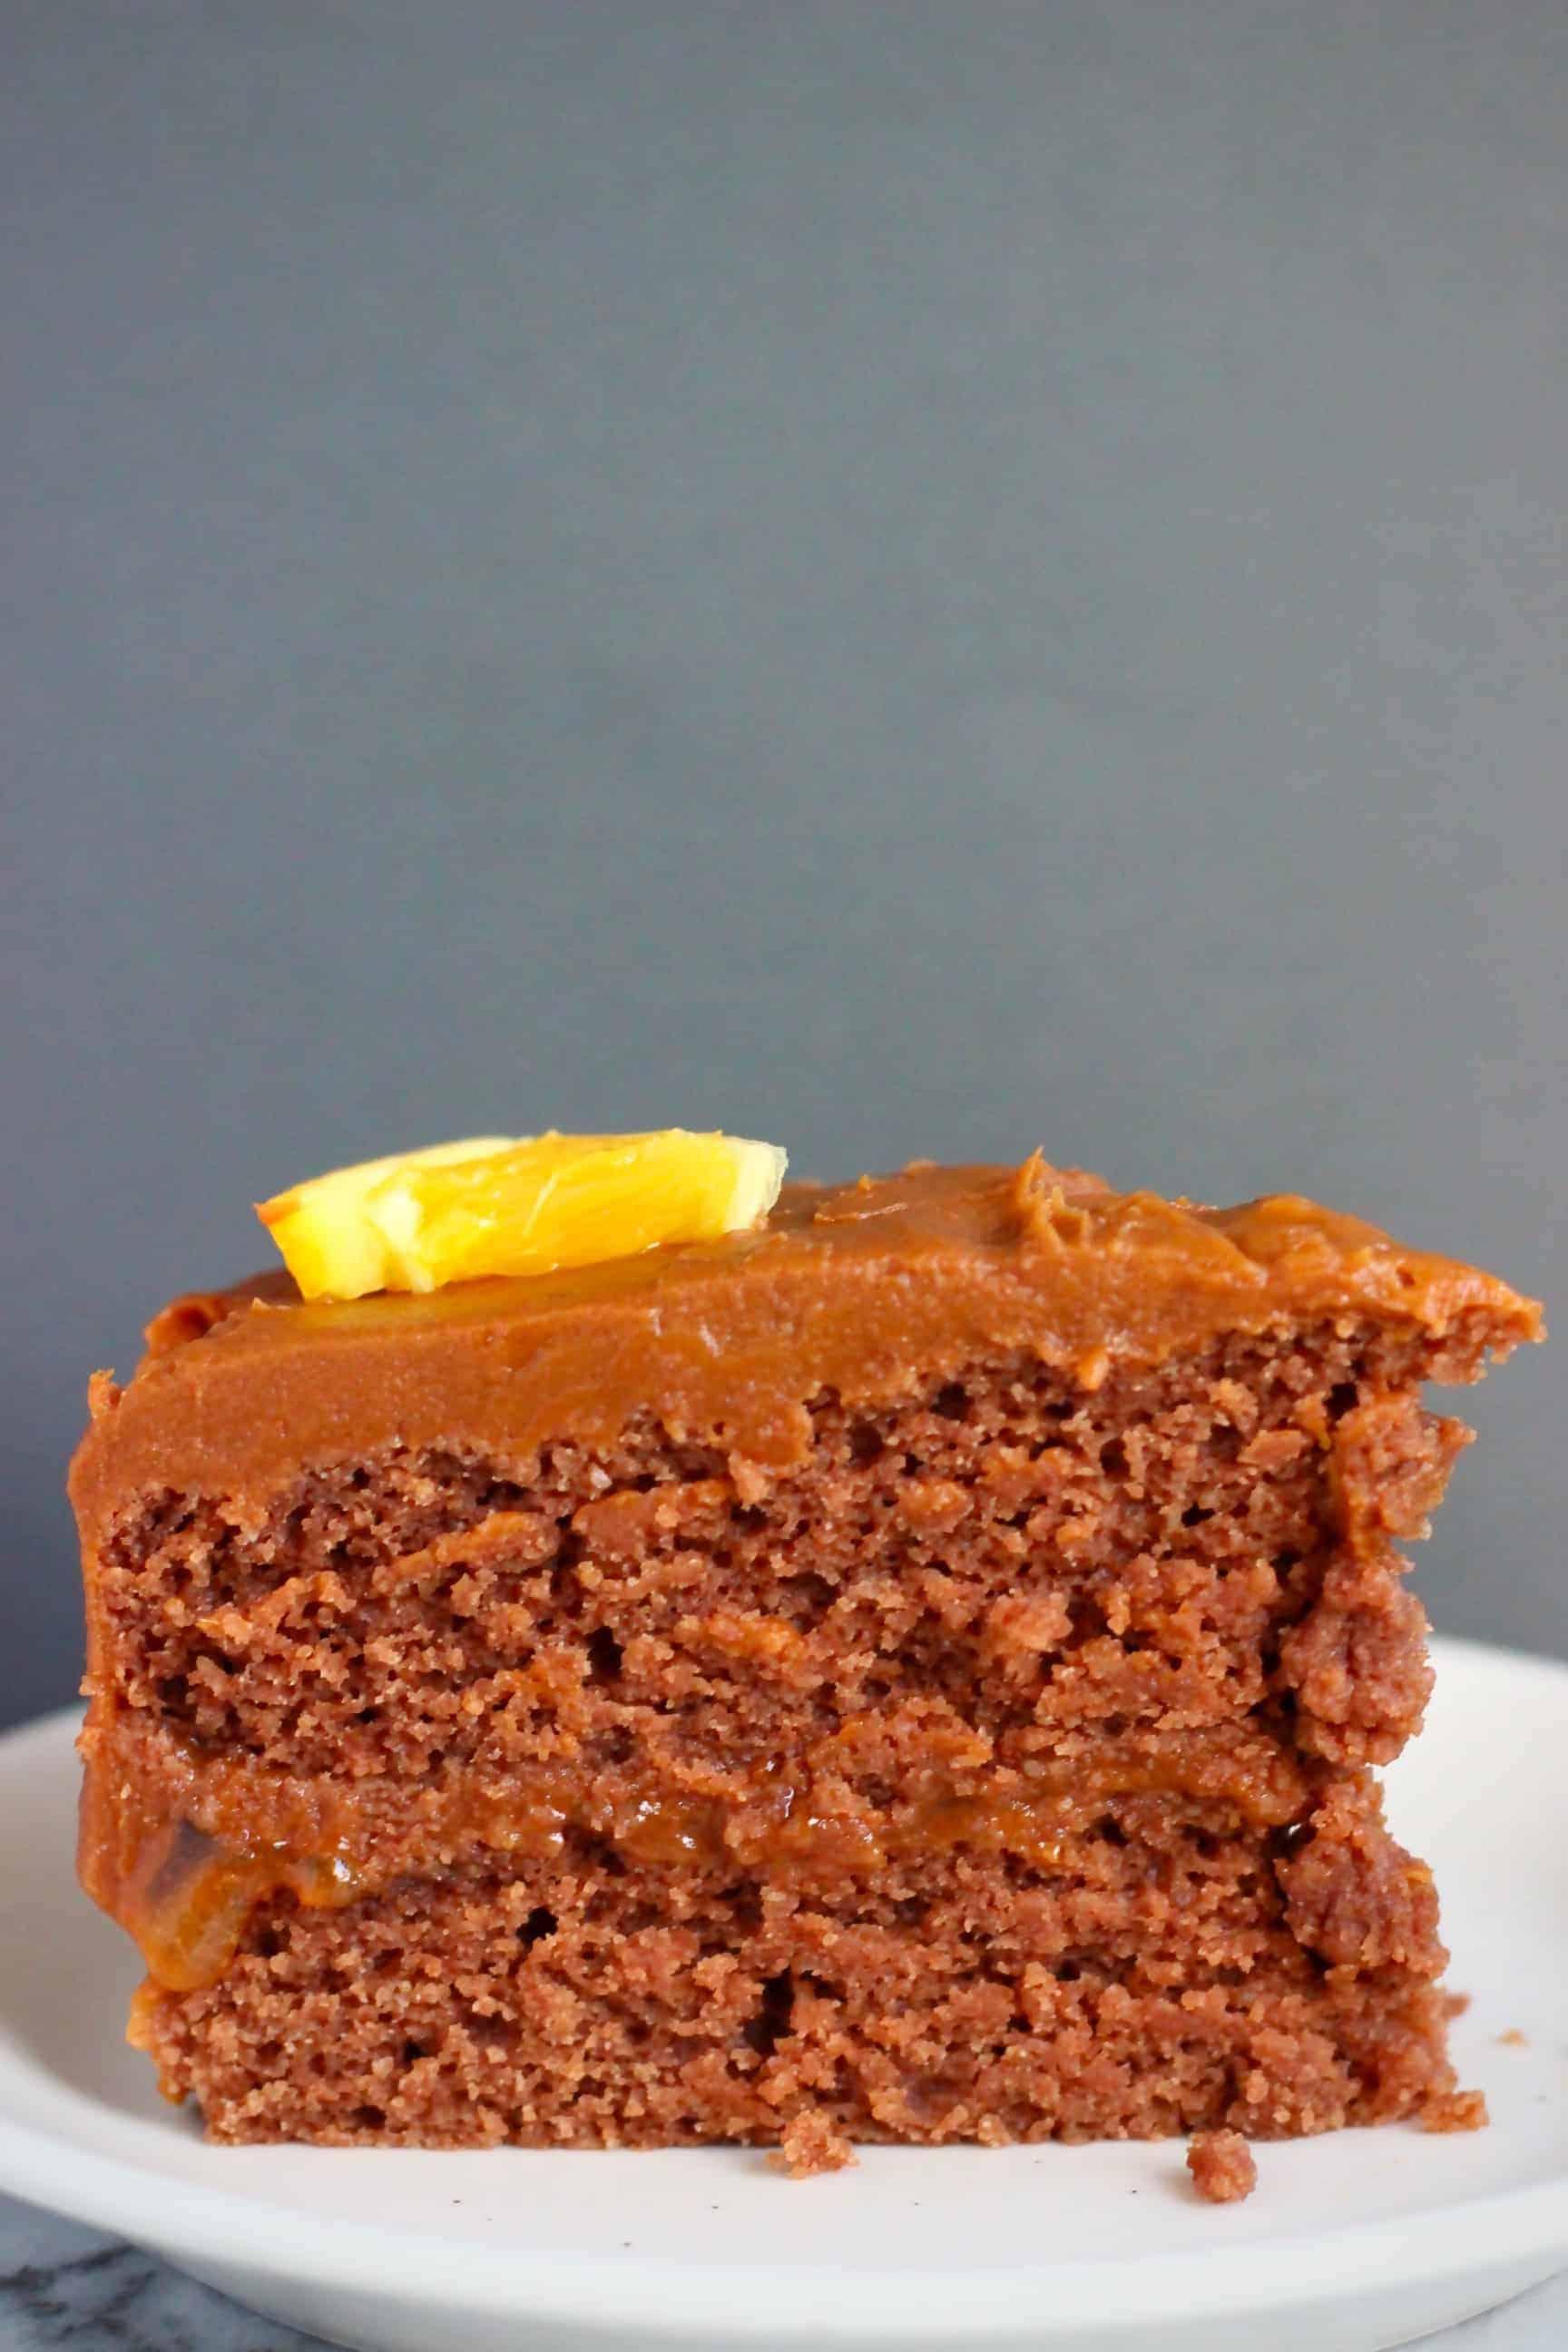 A slice of chocolate orange sponge sandwiched with chocolate frosting topped with a slice of orange against a dark grey background